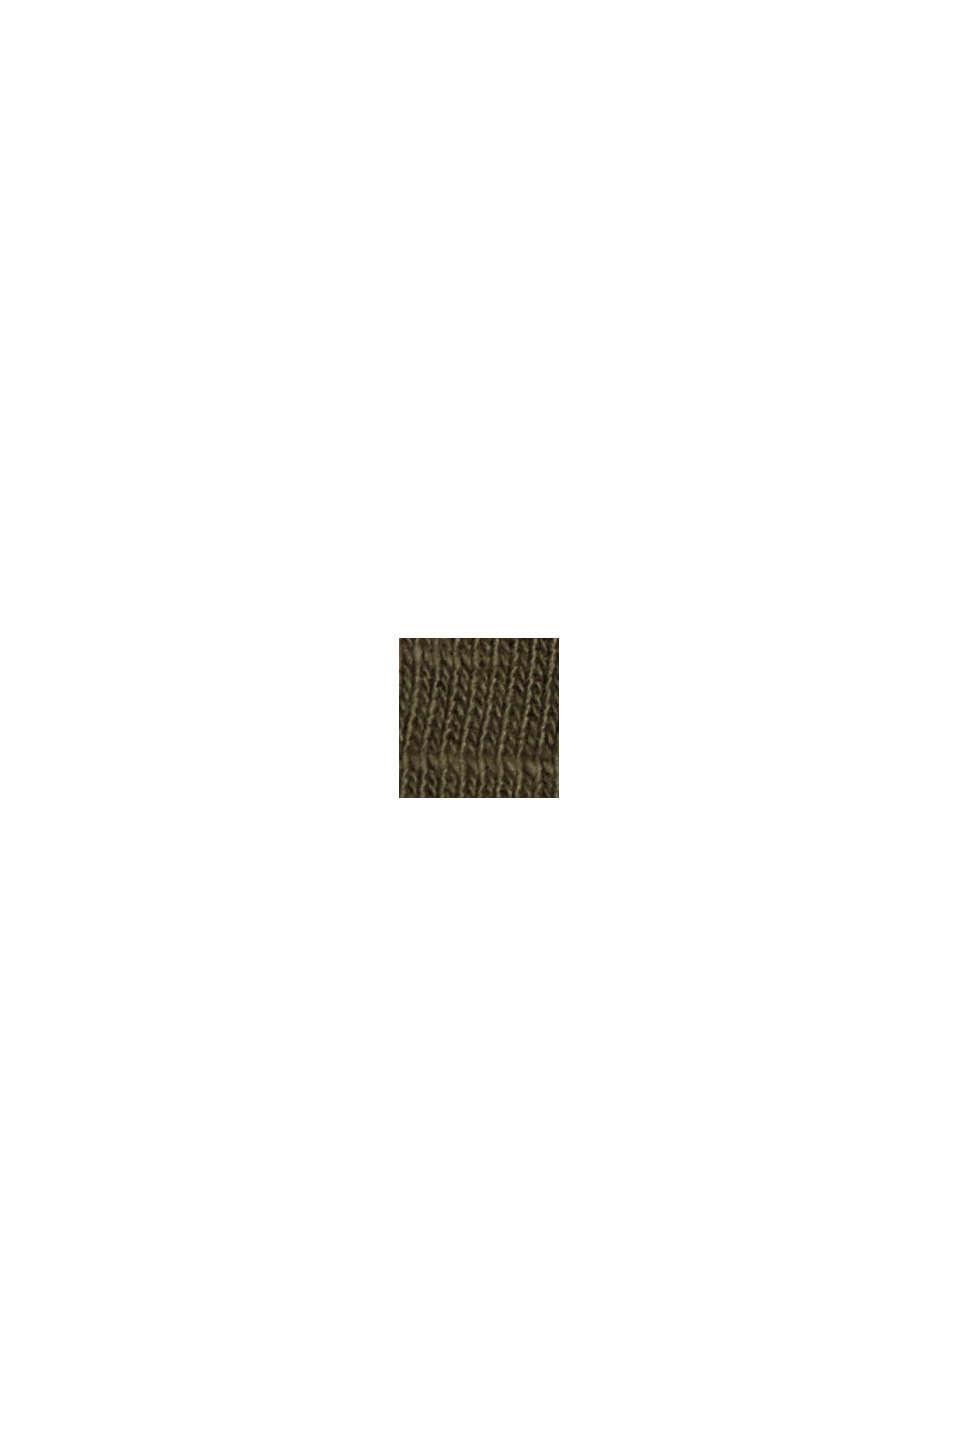 Sweatshirt culottes made of 100% organic cotton, KHAKI GREEN, swatch